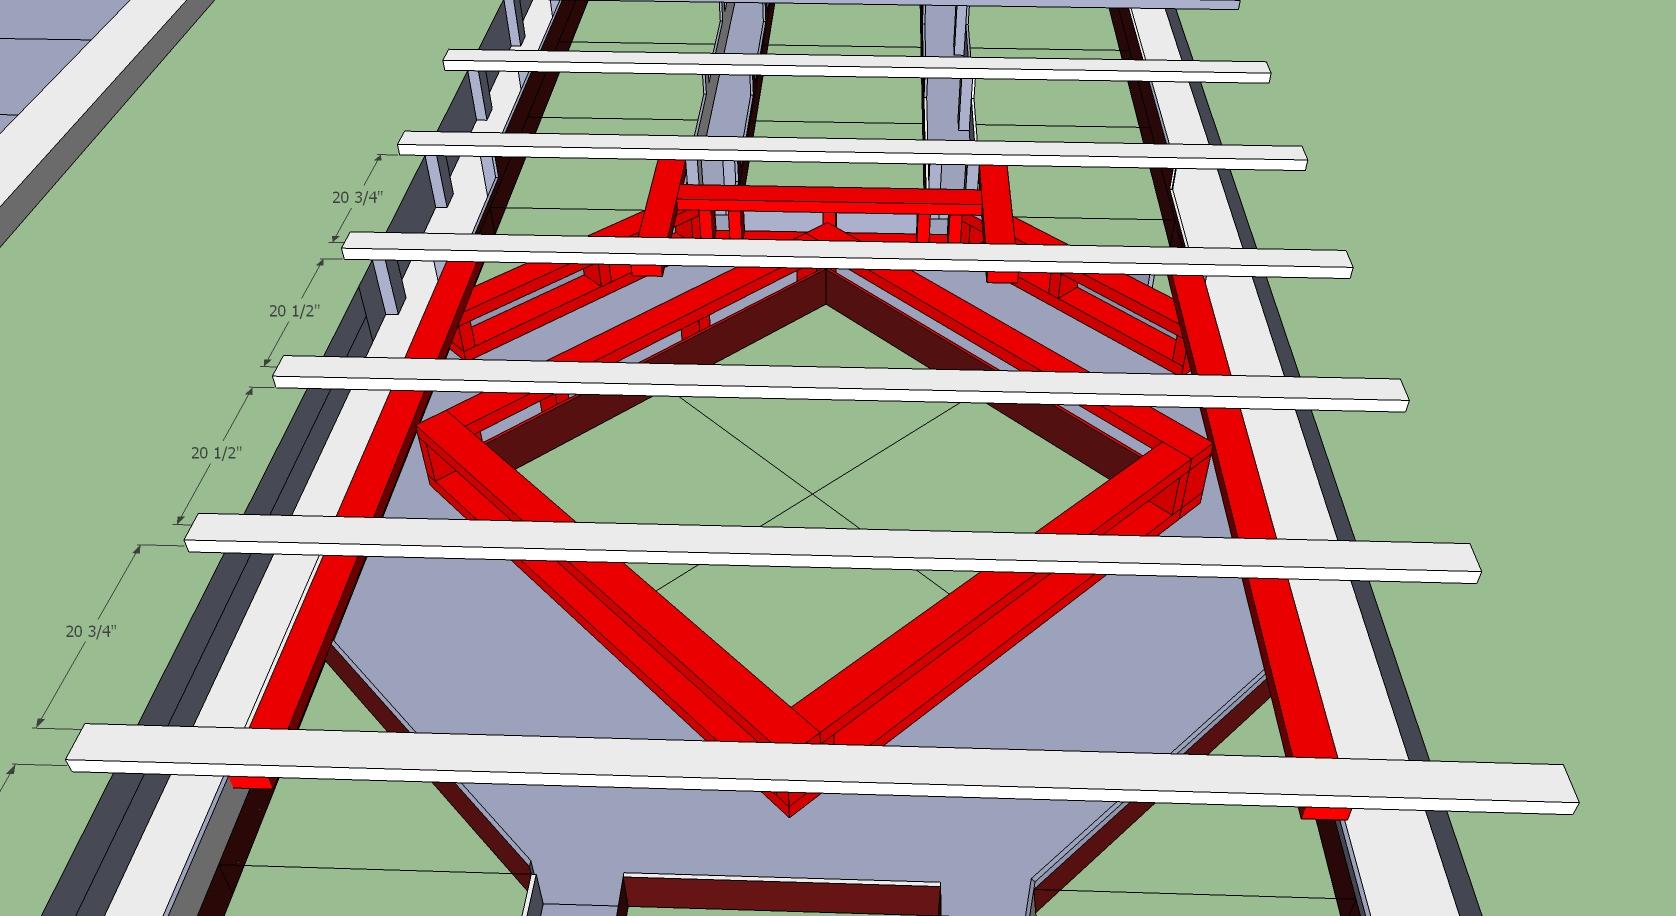 ceiling-plans.jpg